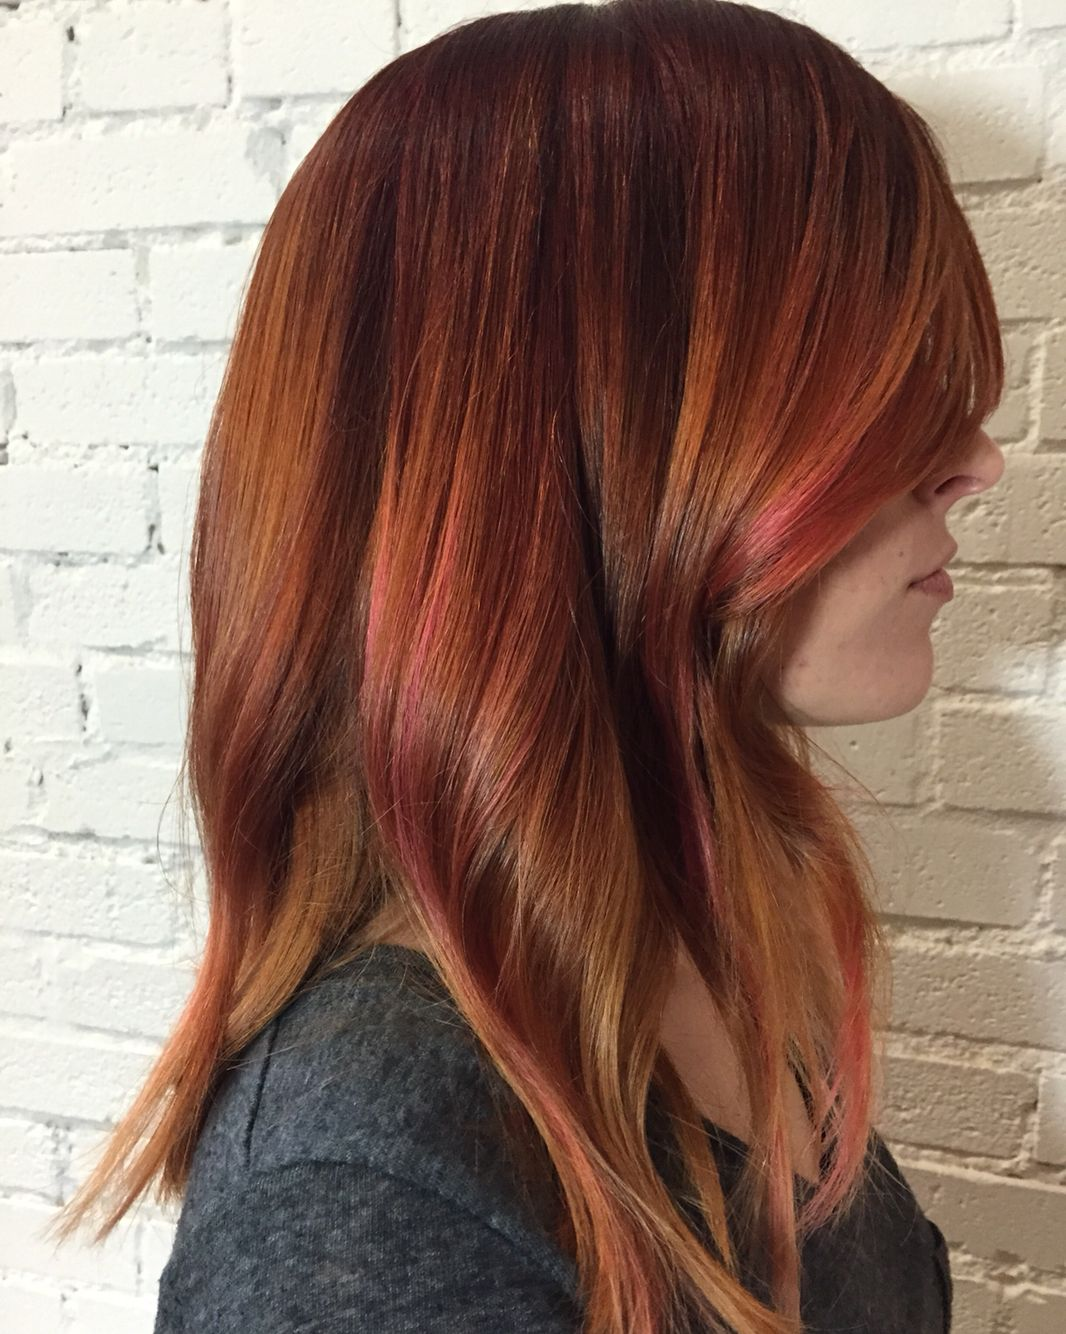 Hair by Kristen Linares httpwwwkristenlinarescom Based in St